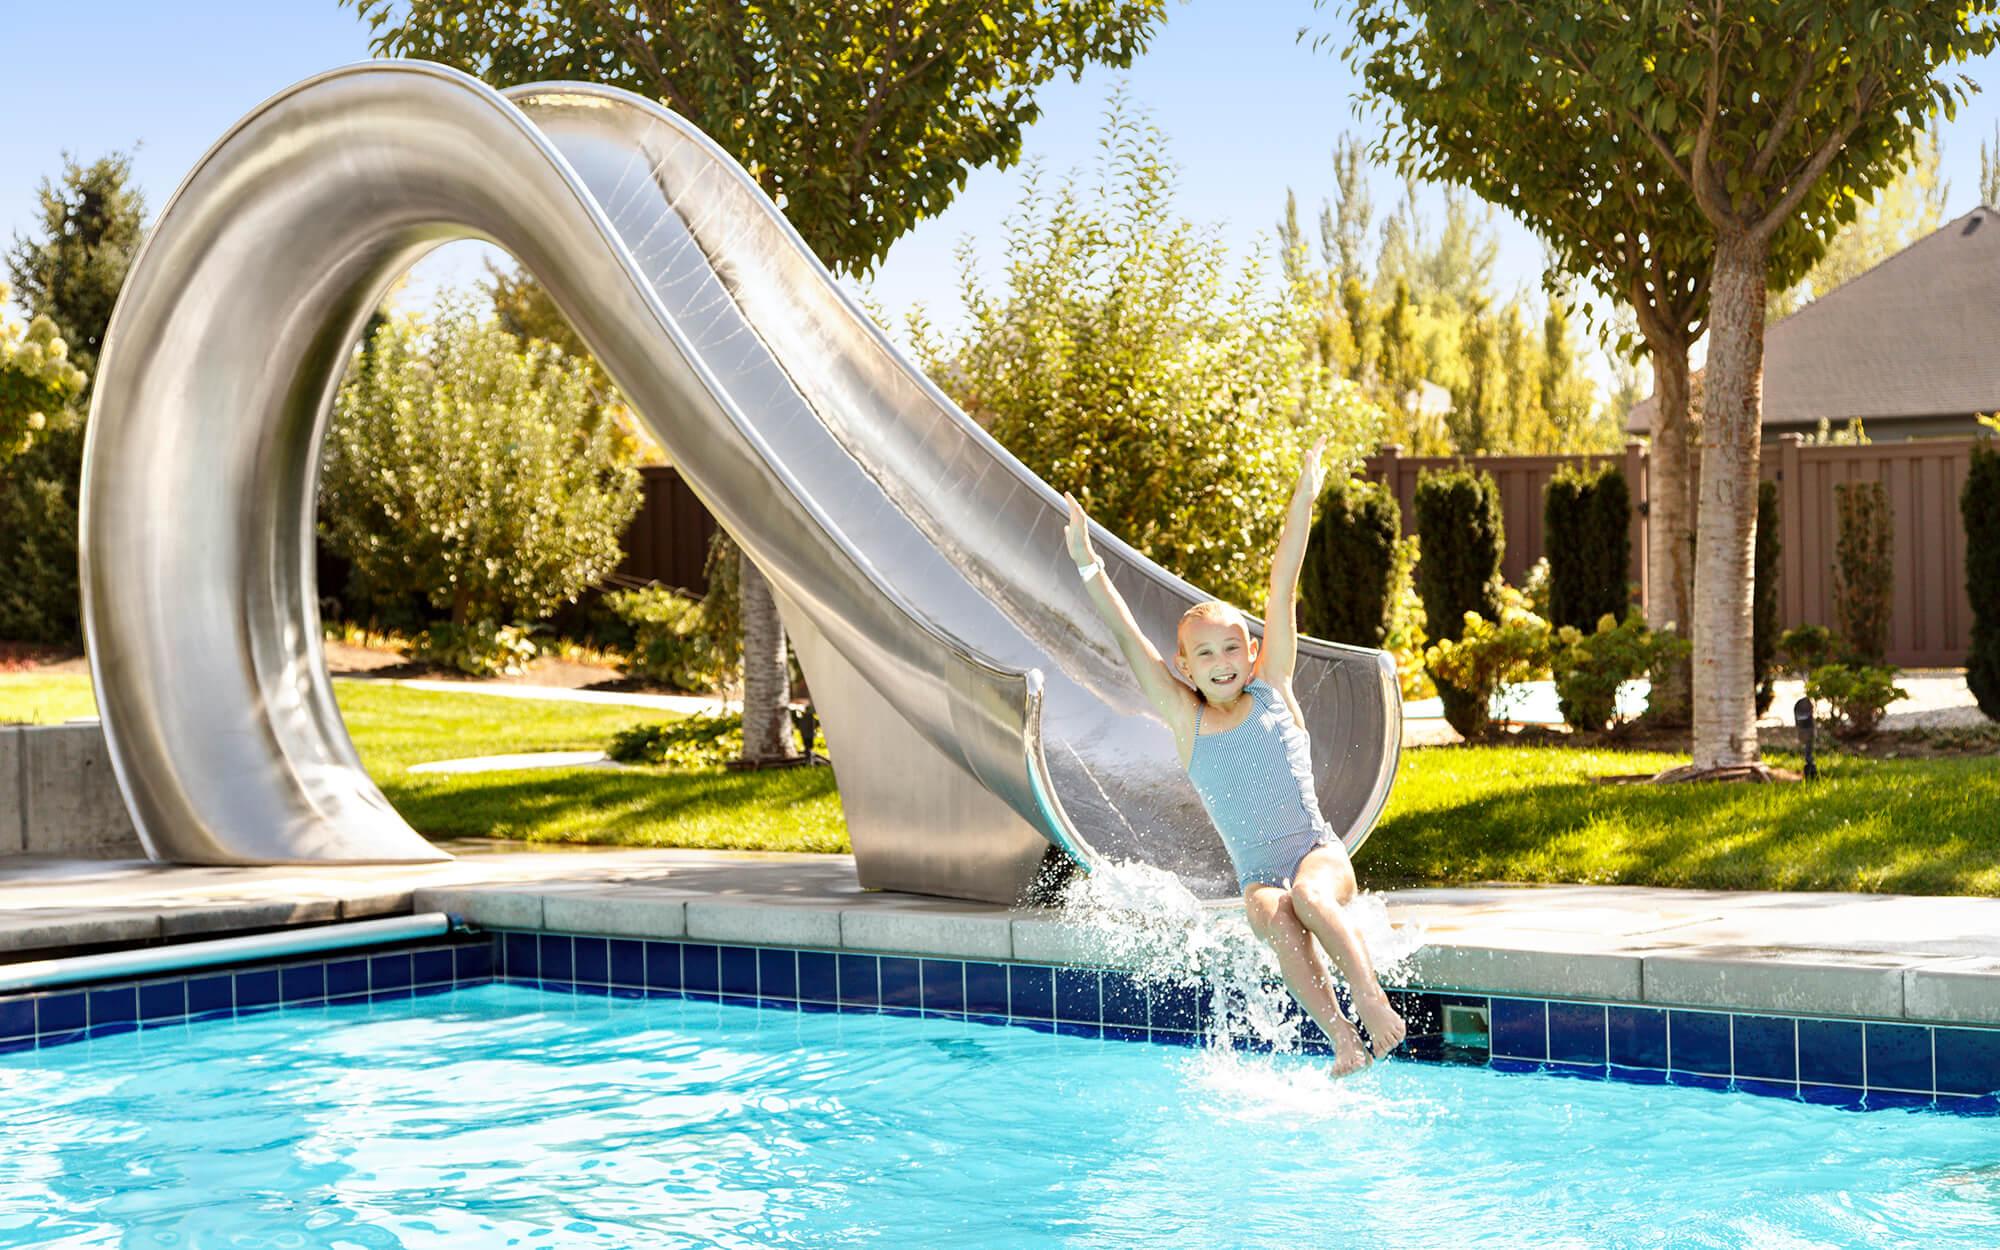 Easy Install Residential Pool Slide Waha By Splinterworks